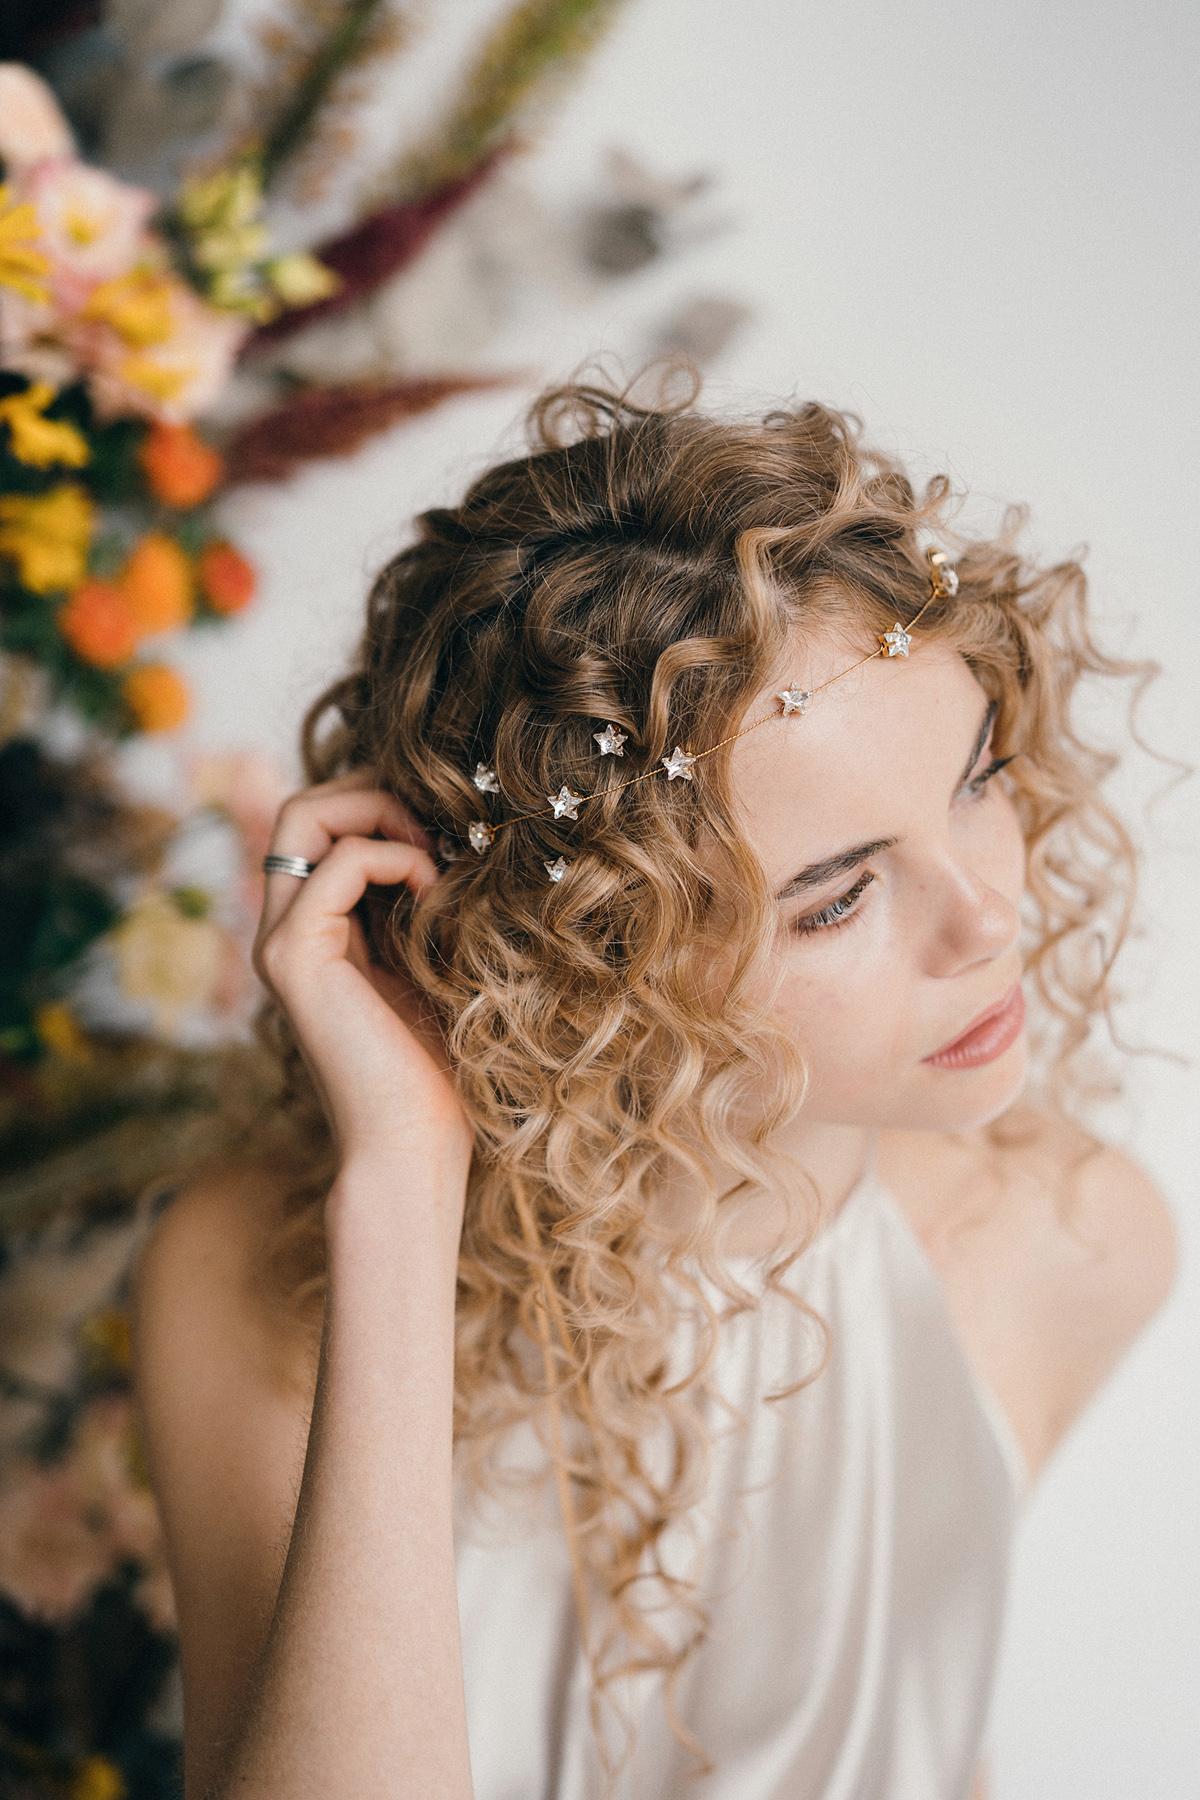 kiểu tóc cô dâu